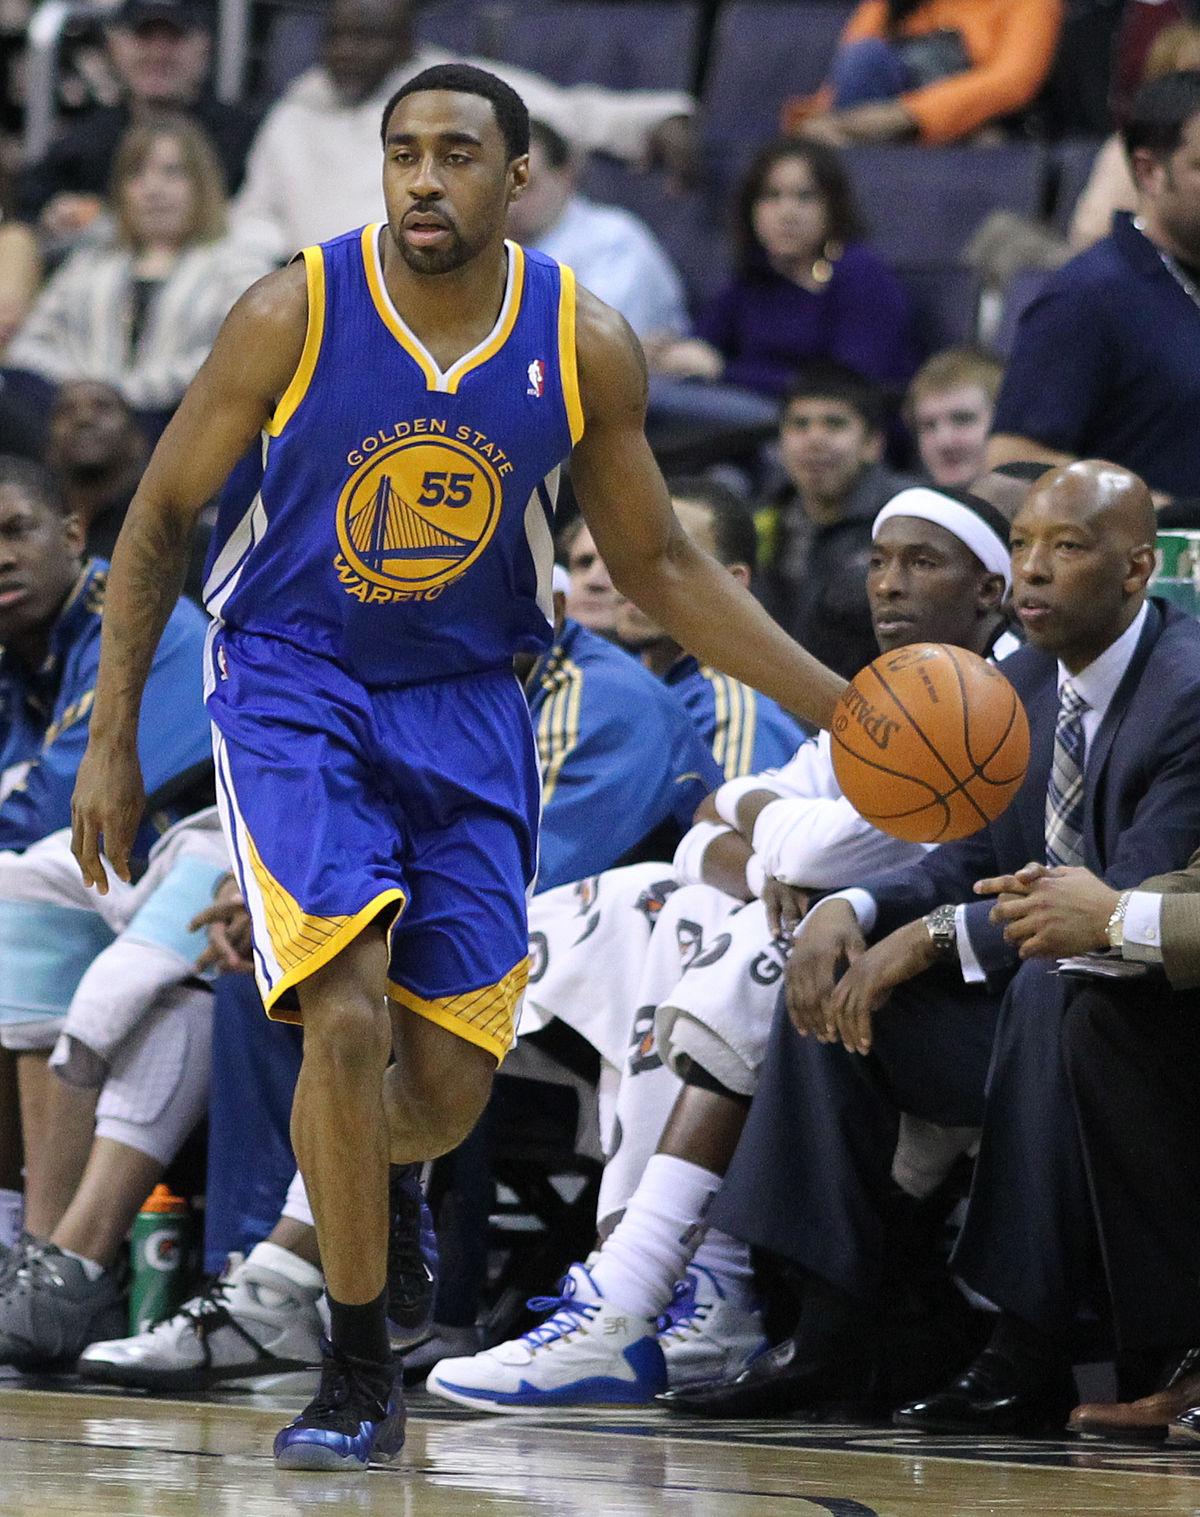 Reggie Williams basketball born 1986